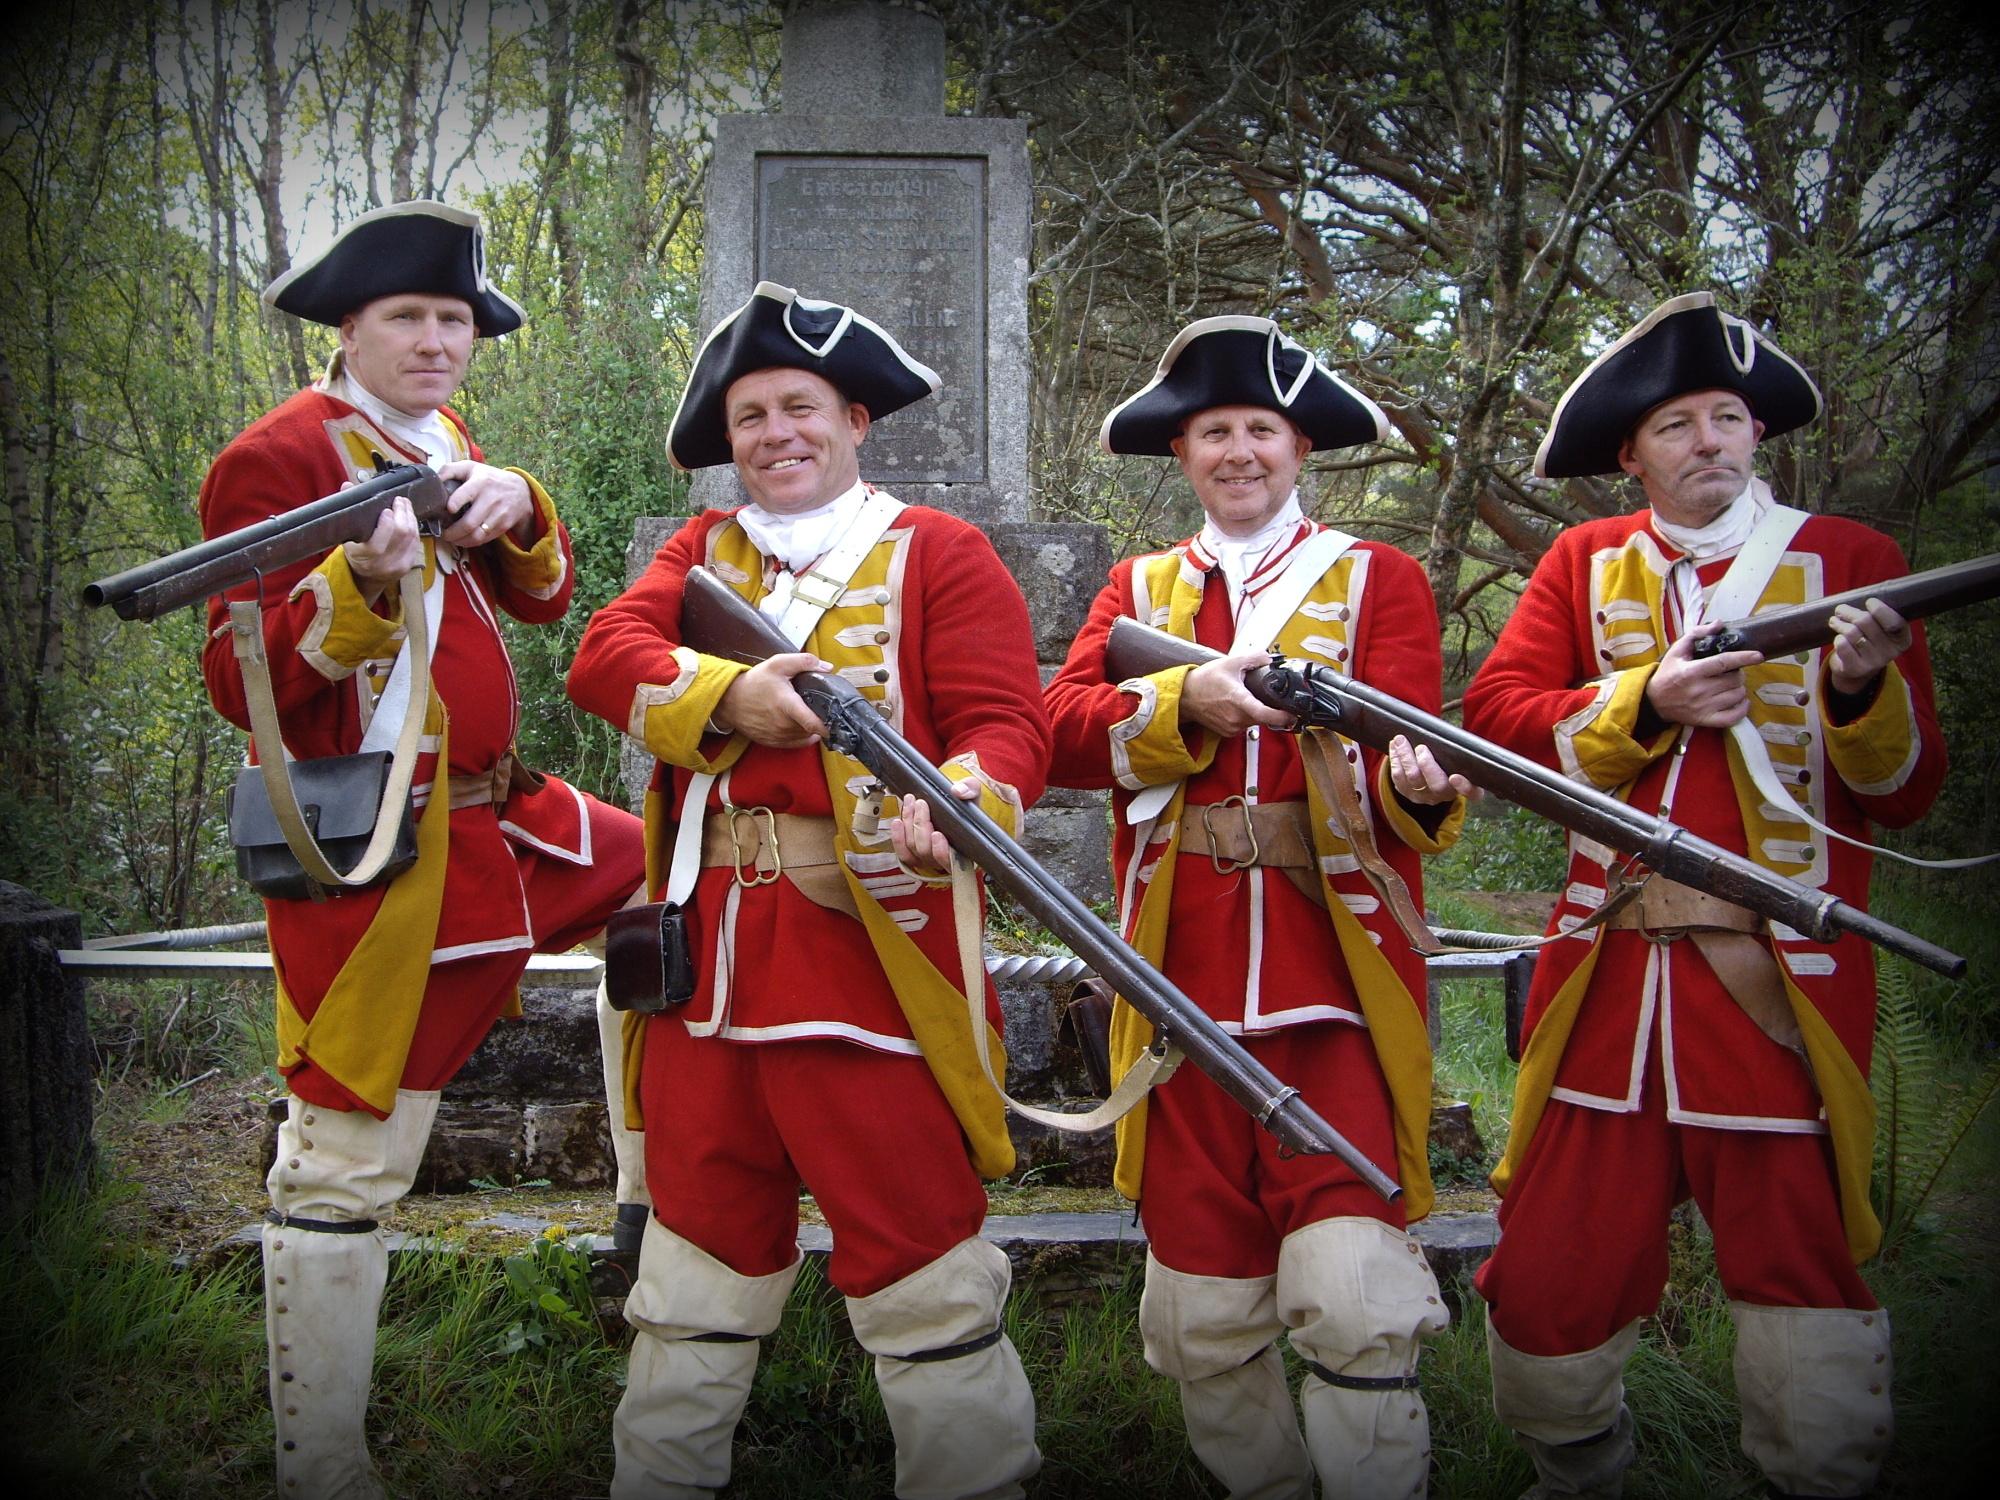 Scottish Red Coats